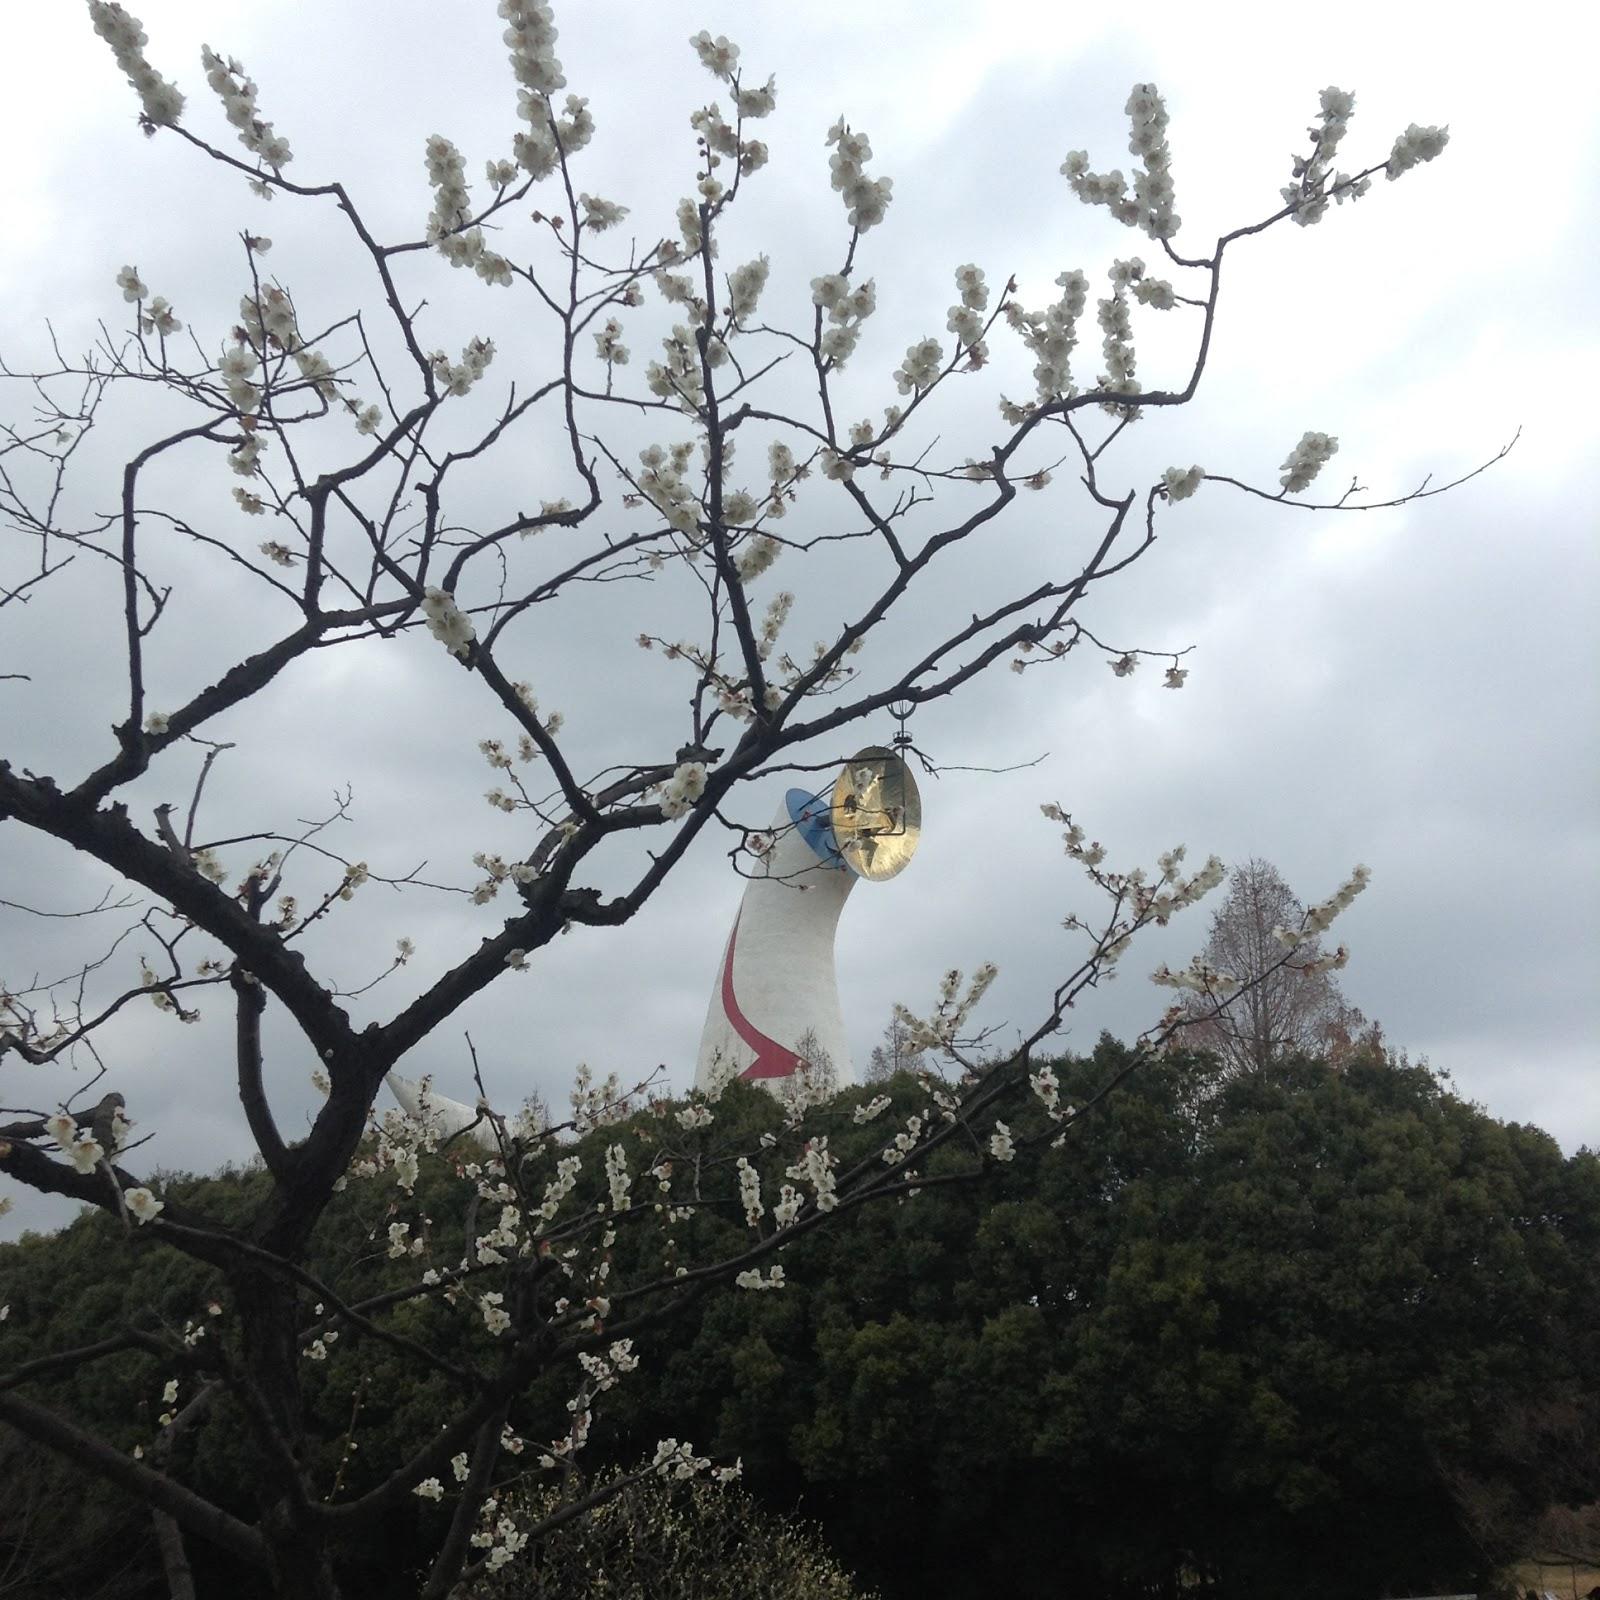 Plum blossom Banpaku Kinen Koen